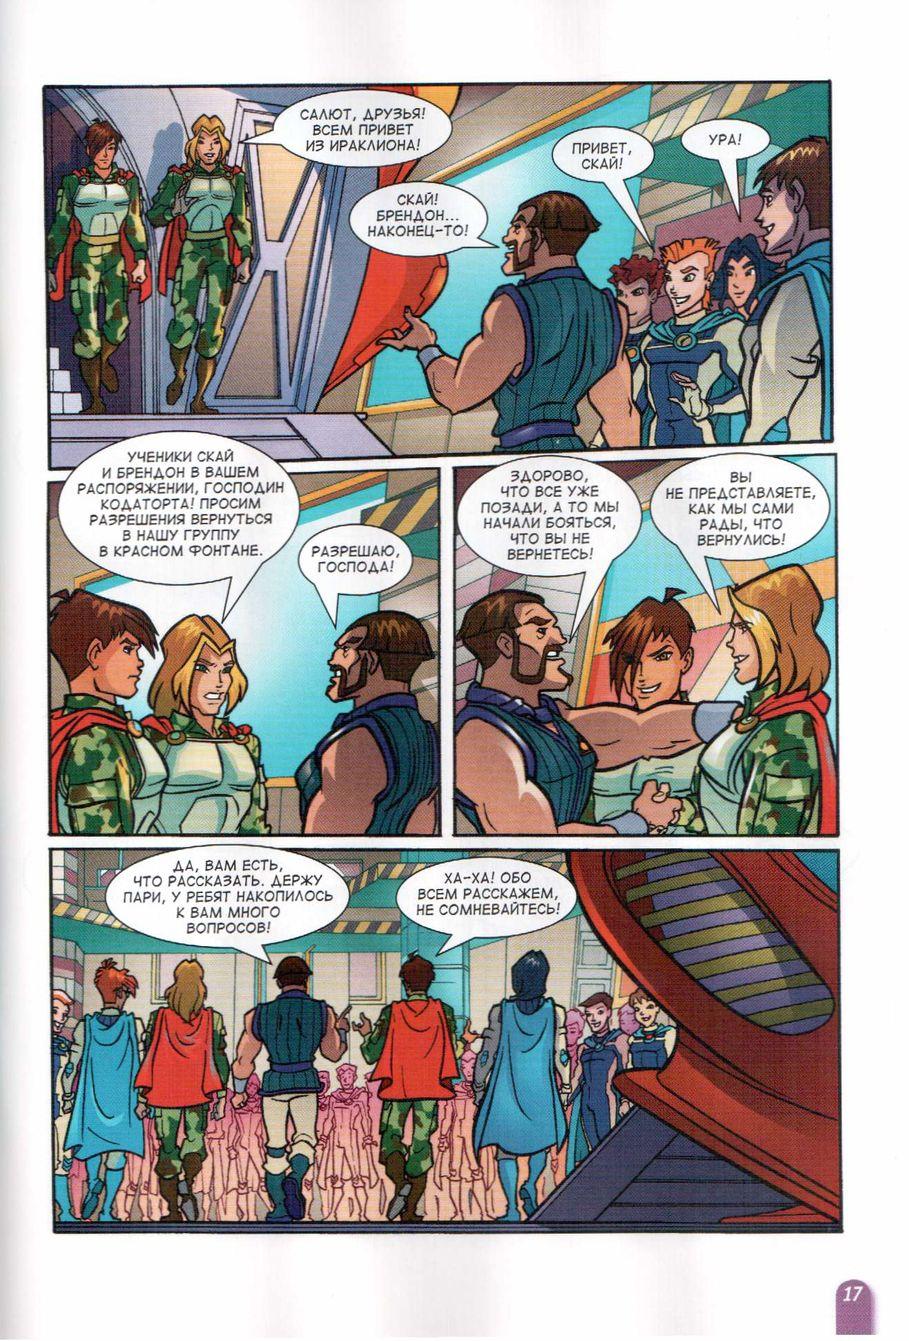 Комикс Винкс Winx - Любовь и ревность (Журнал Винкс №7 2011) - стр. 17